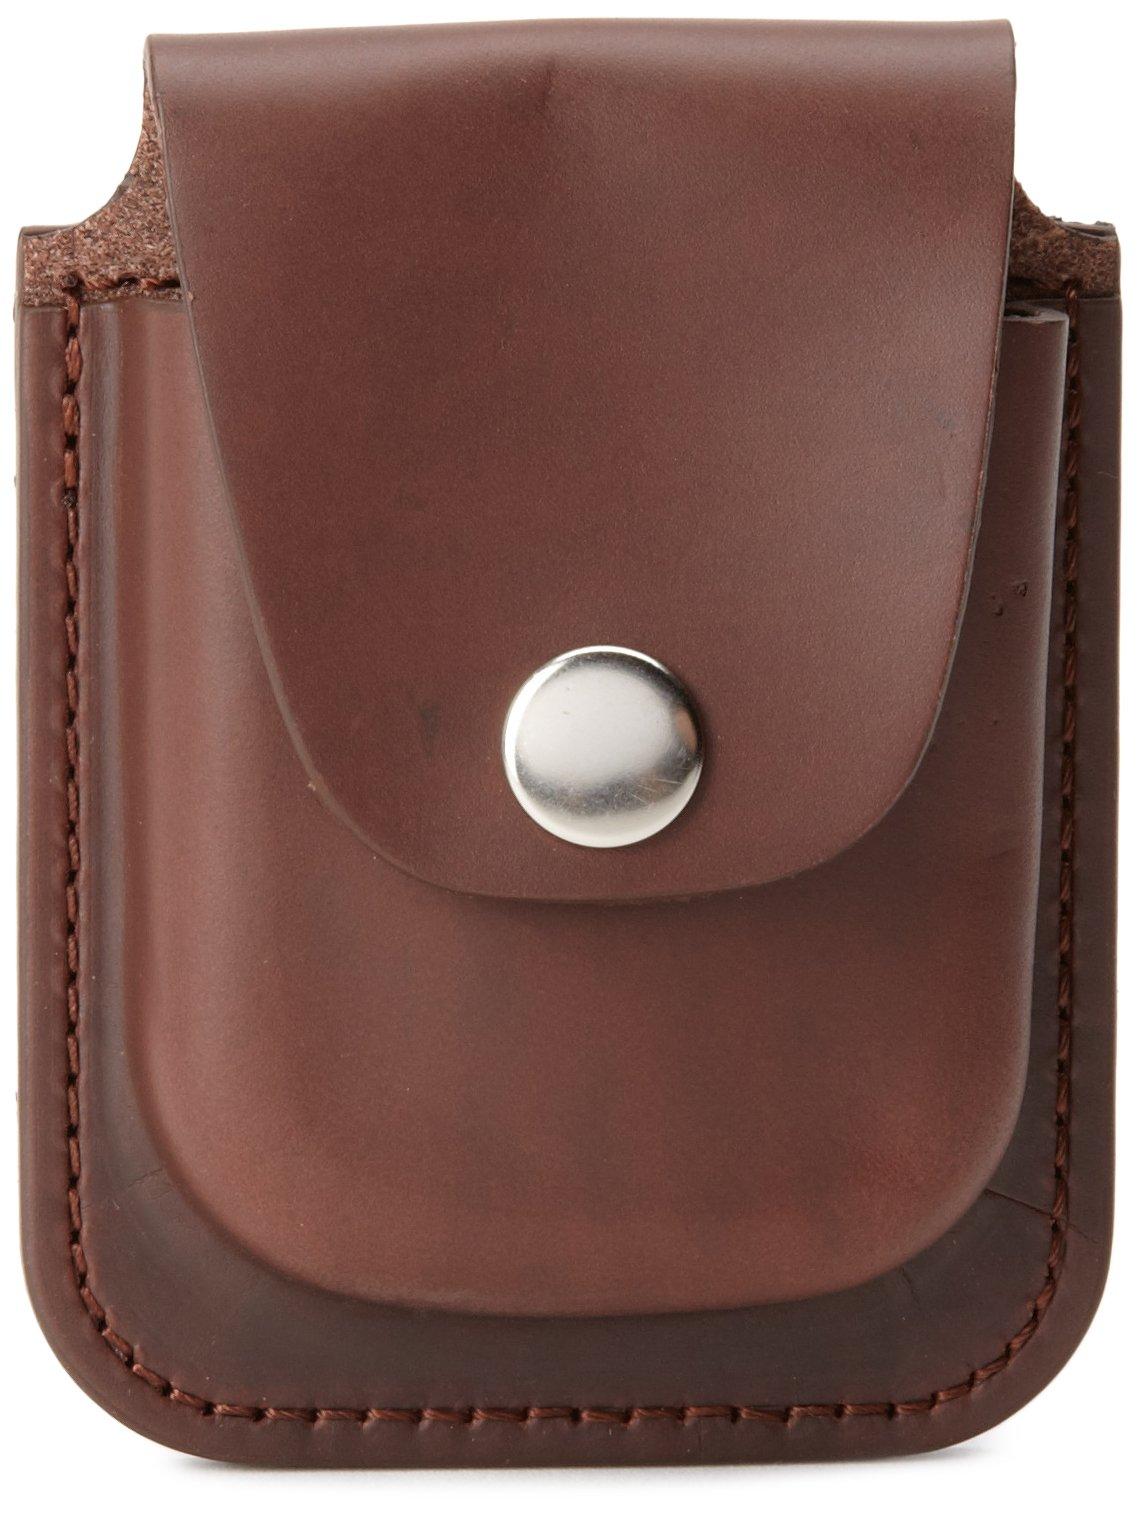 Charles-Hubert, Paris 3572-5 Brown Leather 56mm Pocket Watch Holder by CHARLES-HUBERT PARIS